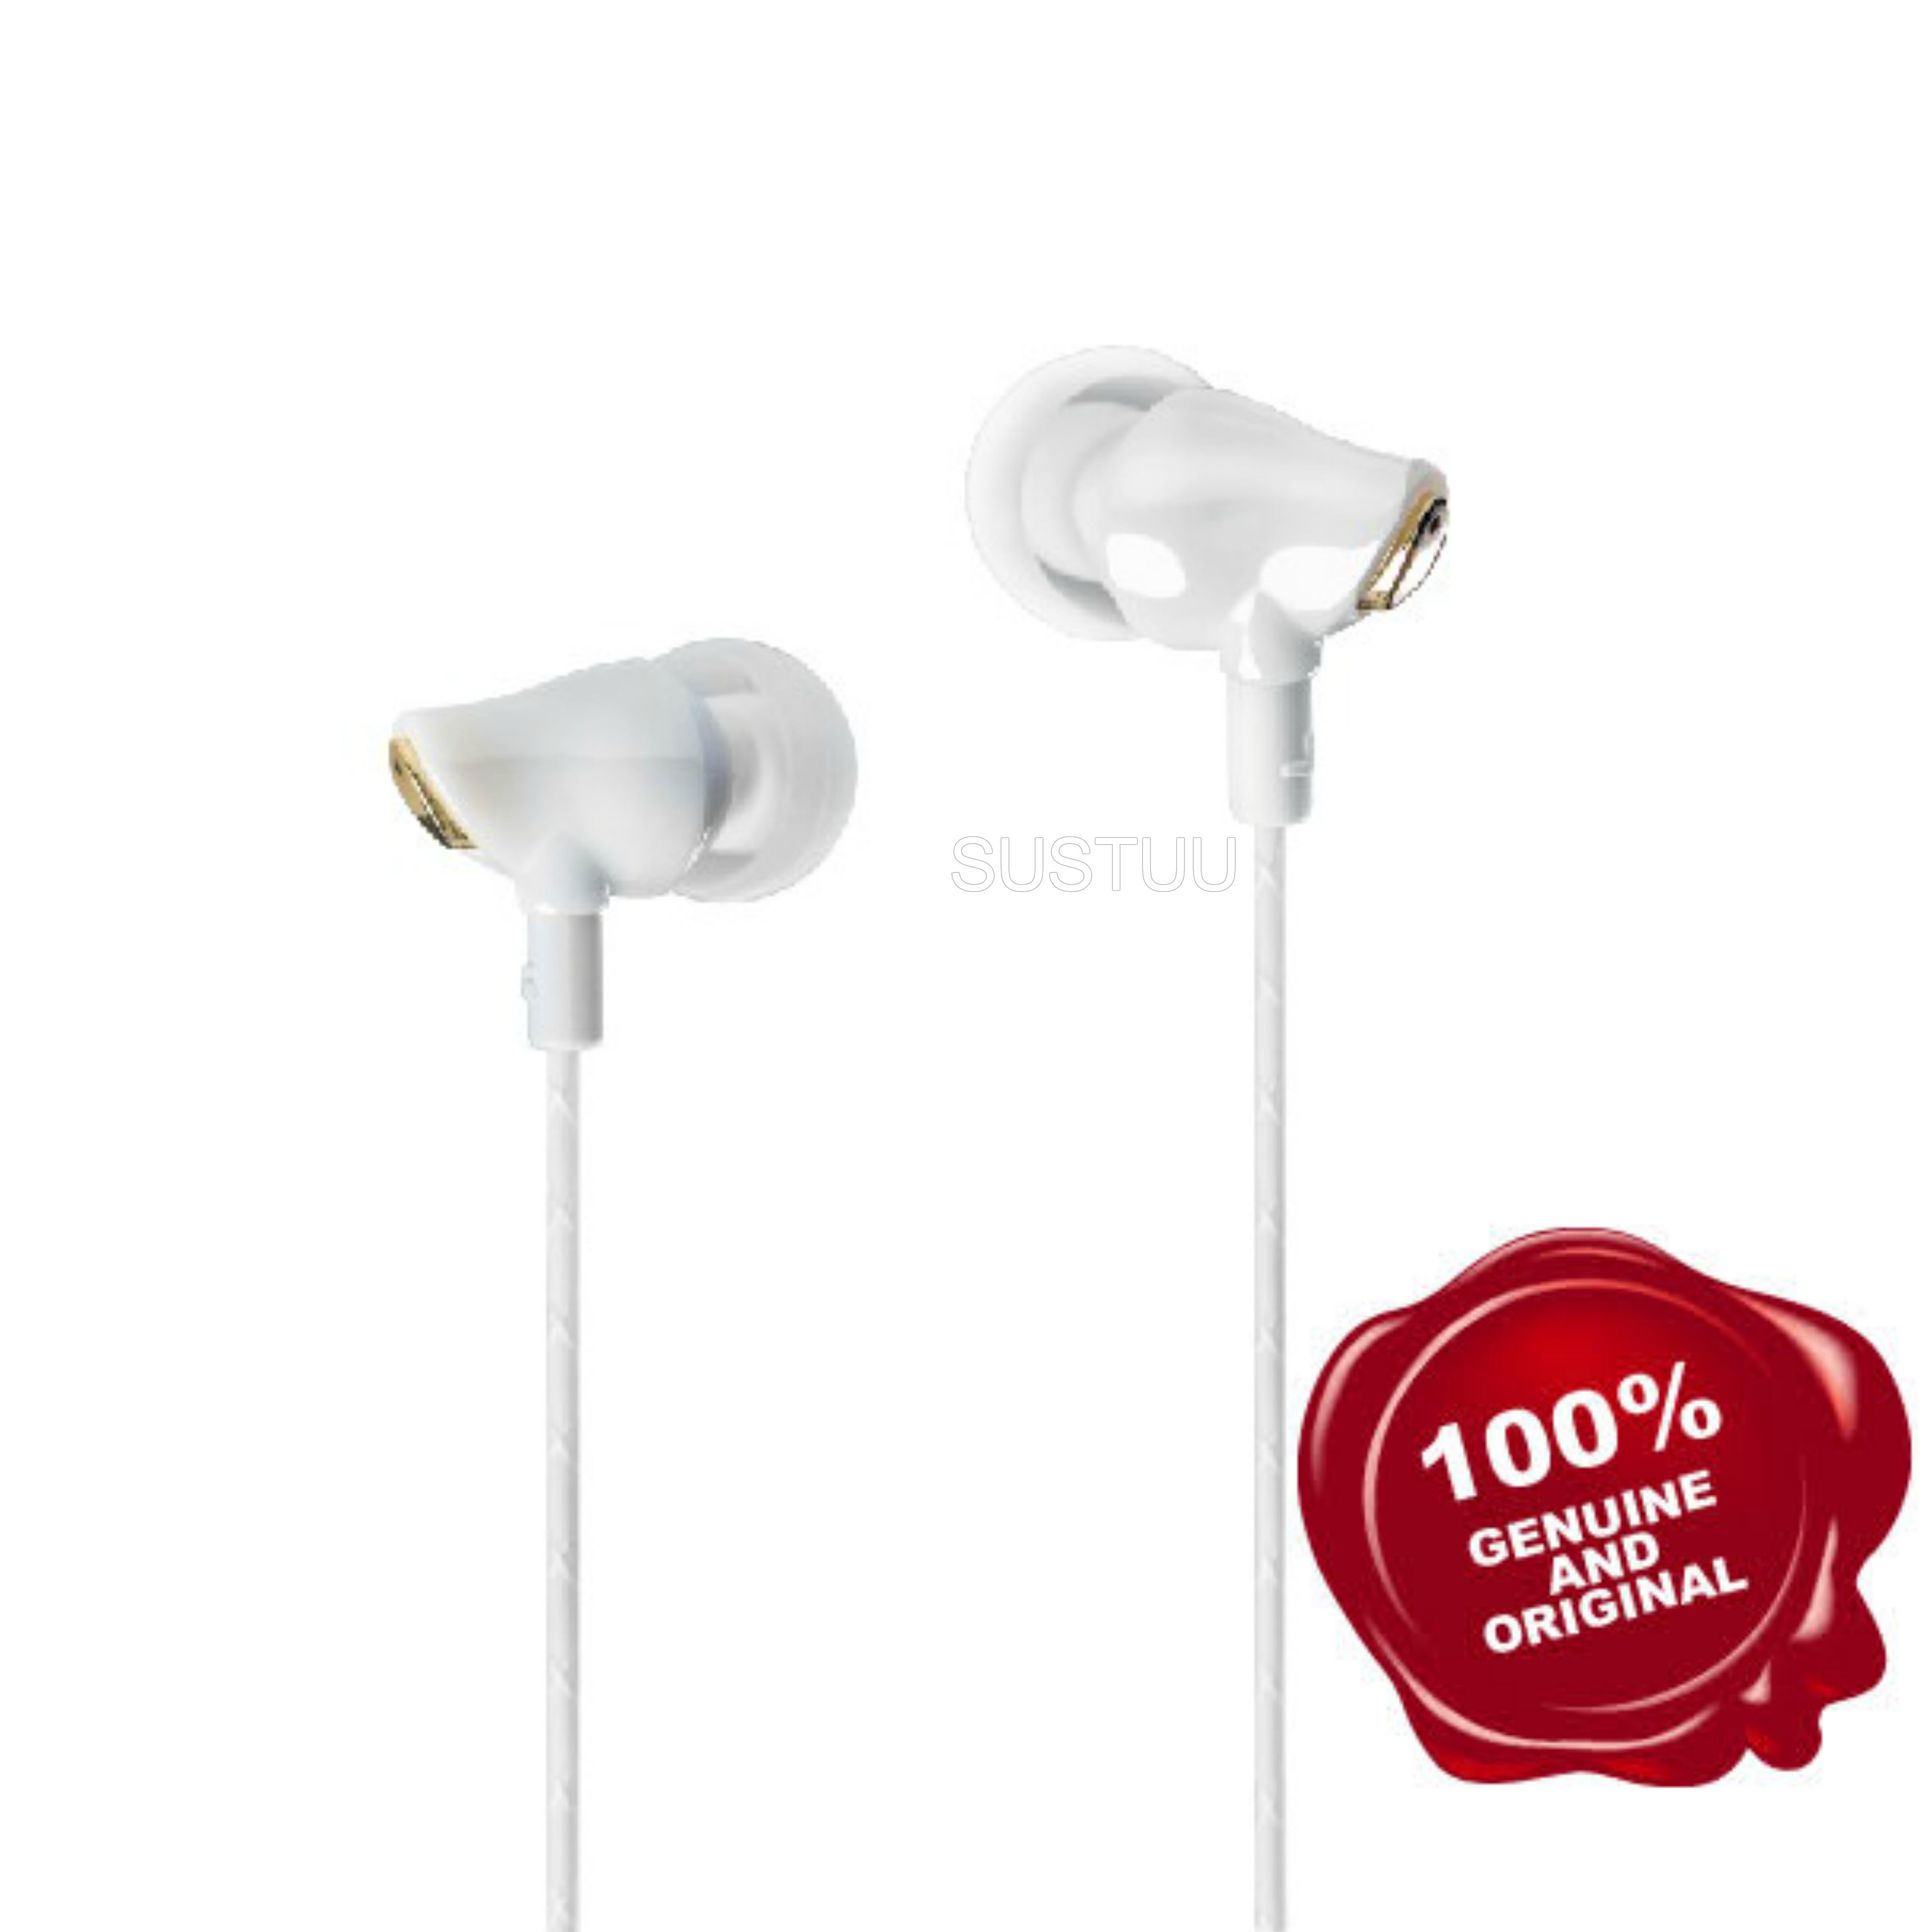 Elyxr Audio ELX-1002 Majestic Ceramic In-Ear Headphones|Hi-Fidelity Sound|White